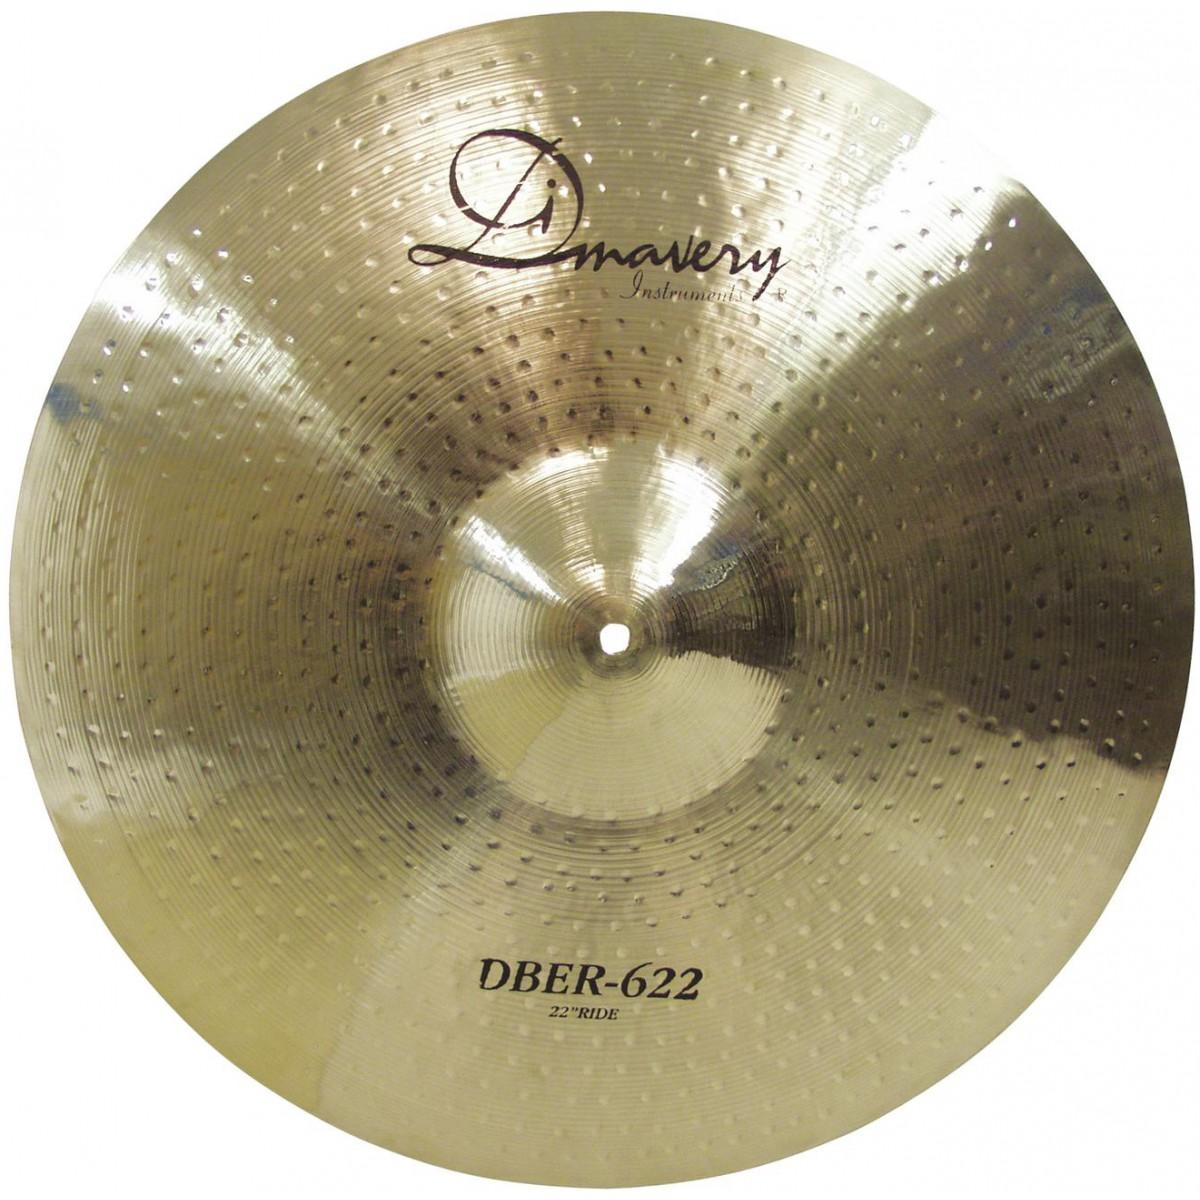 Dimavery DBER-622 činel, 22